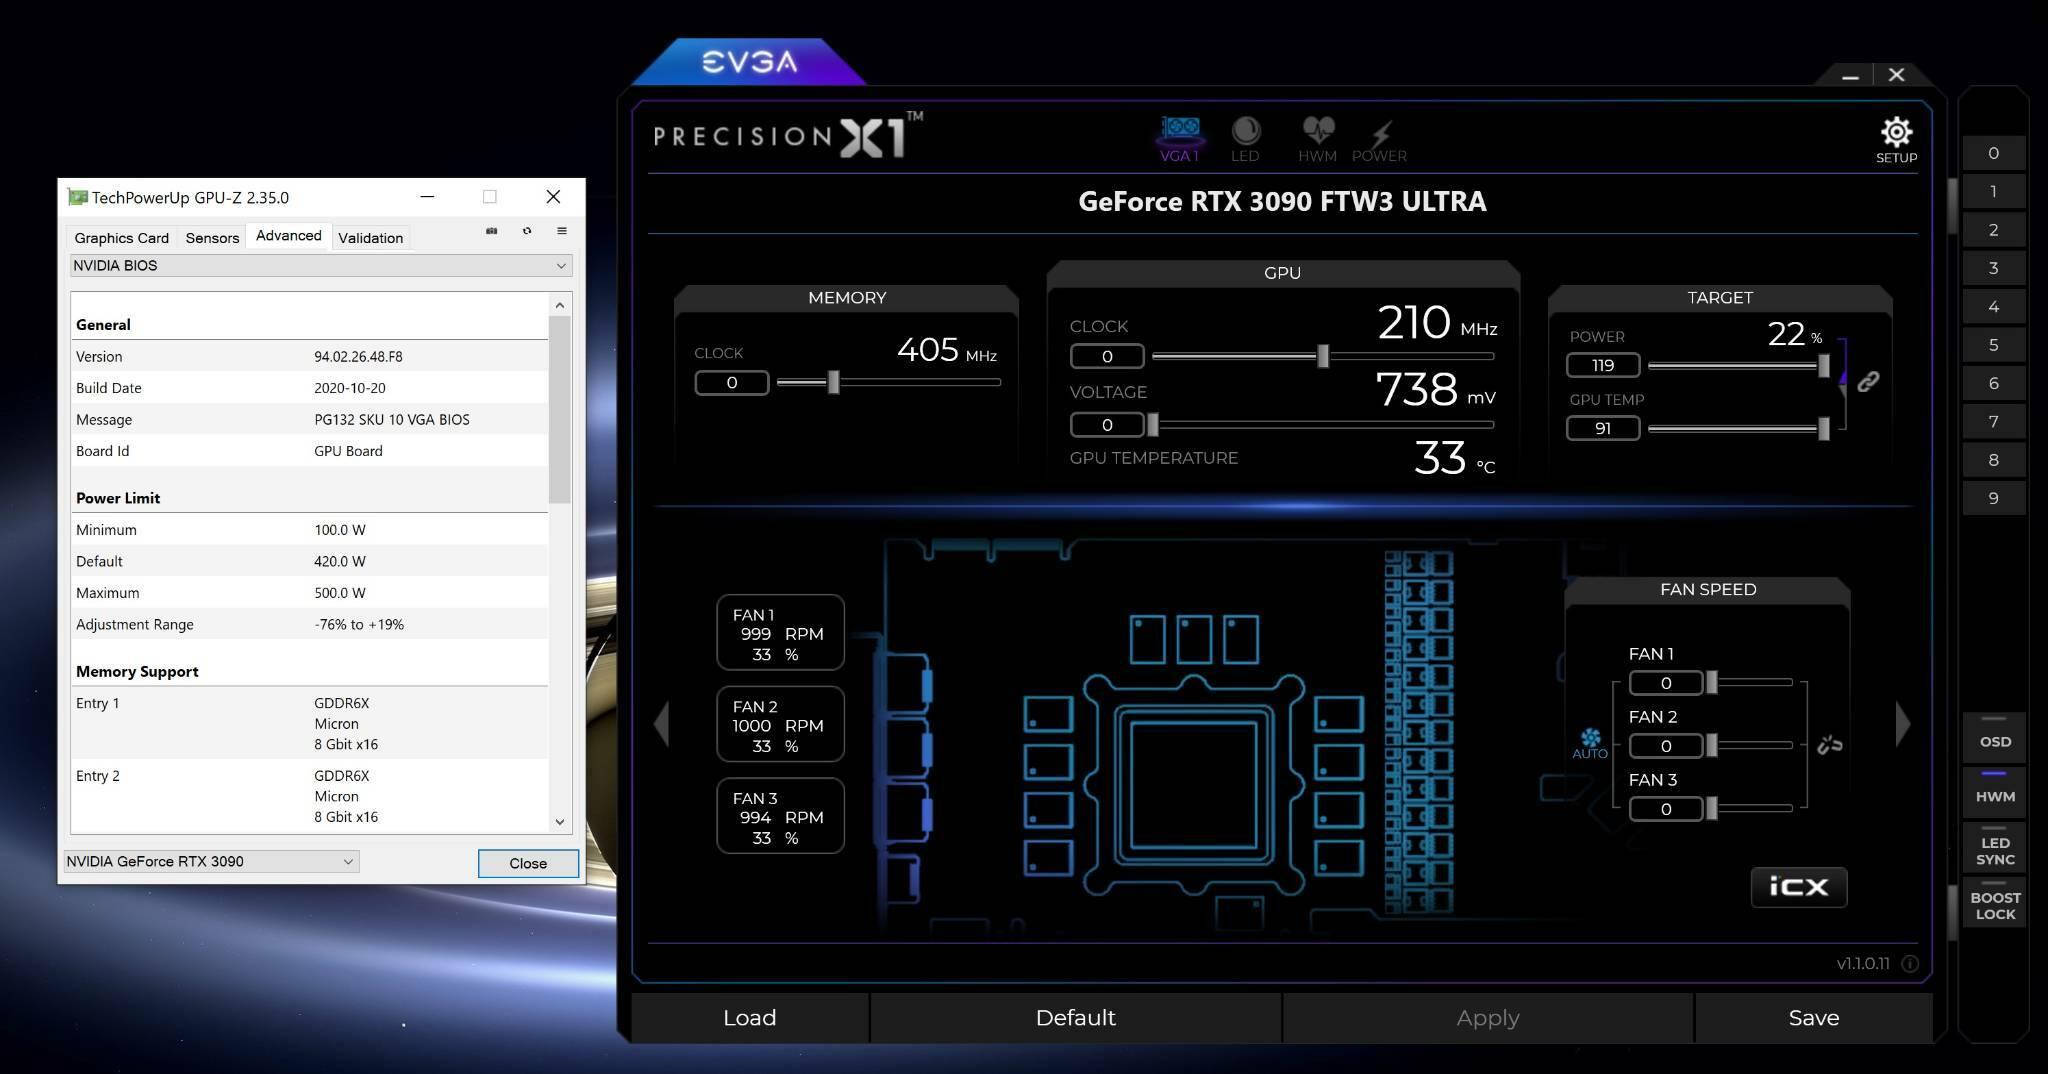 EVGA GeForce RTX 3080 RTX 3090 Overclock